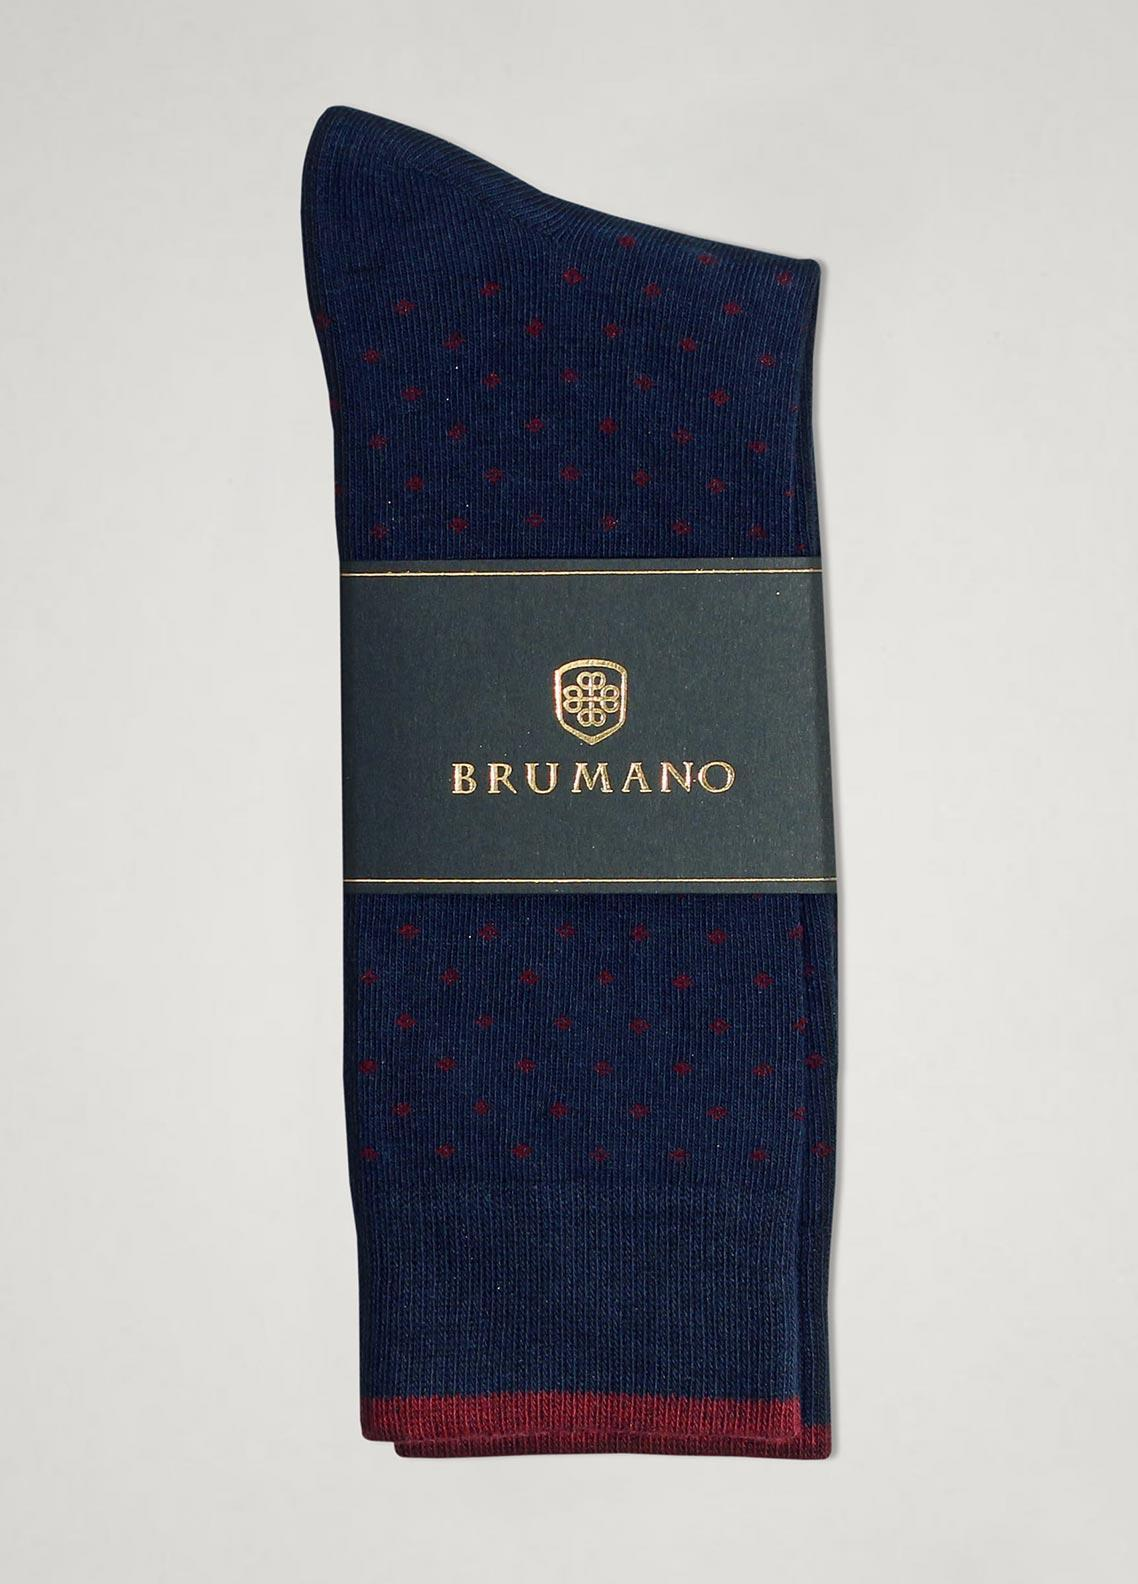 Brumano Cotton Socks SKS-201